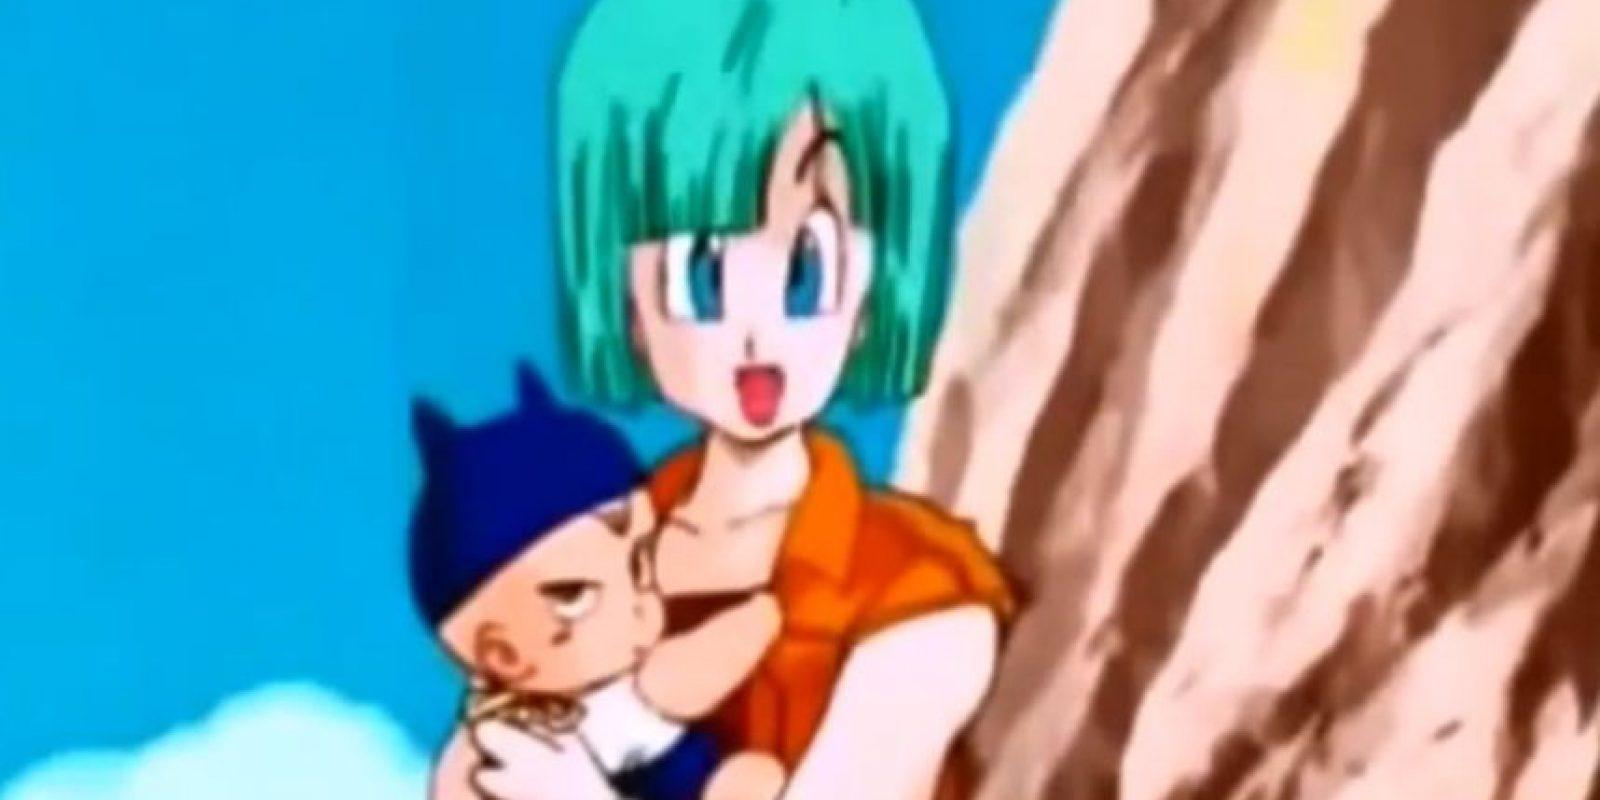 9. Se revela que el padre de Trunks es Vegeta Foto:Toei